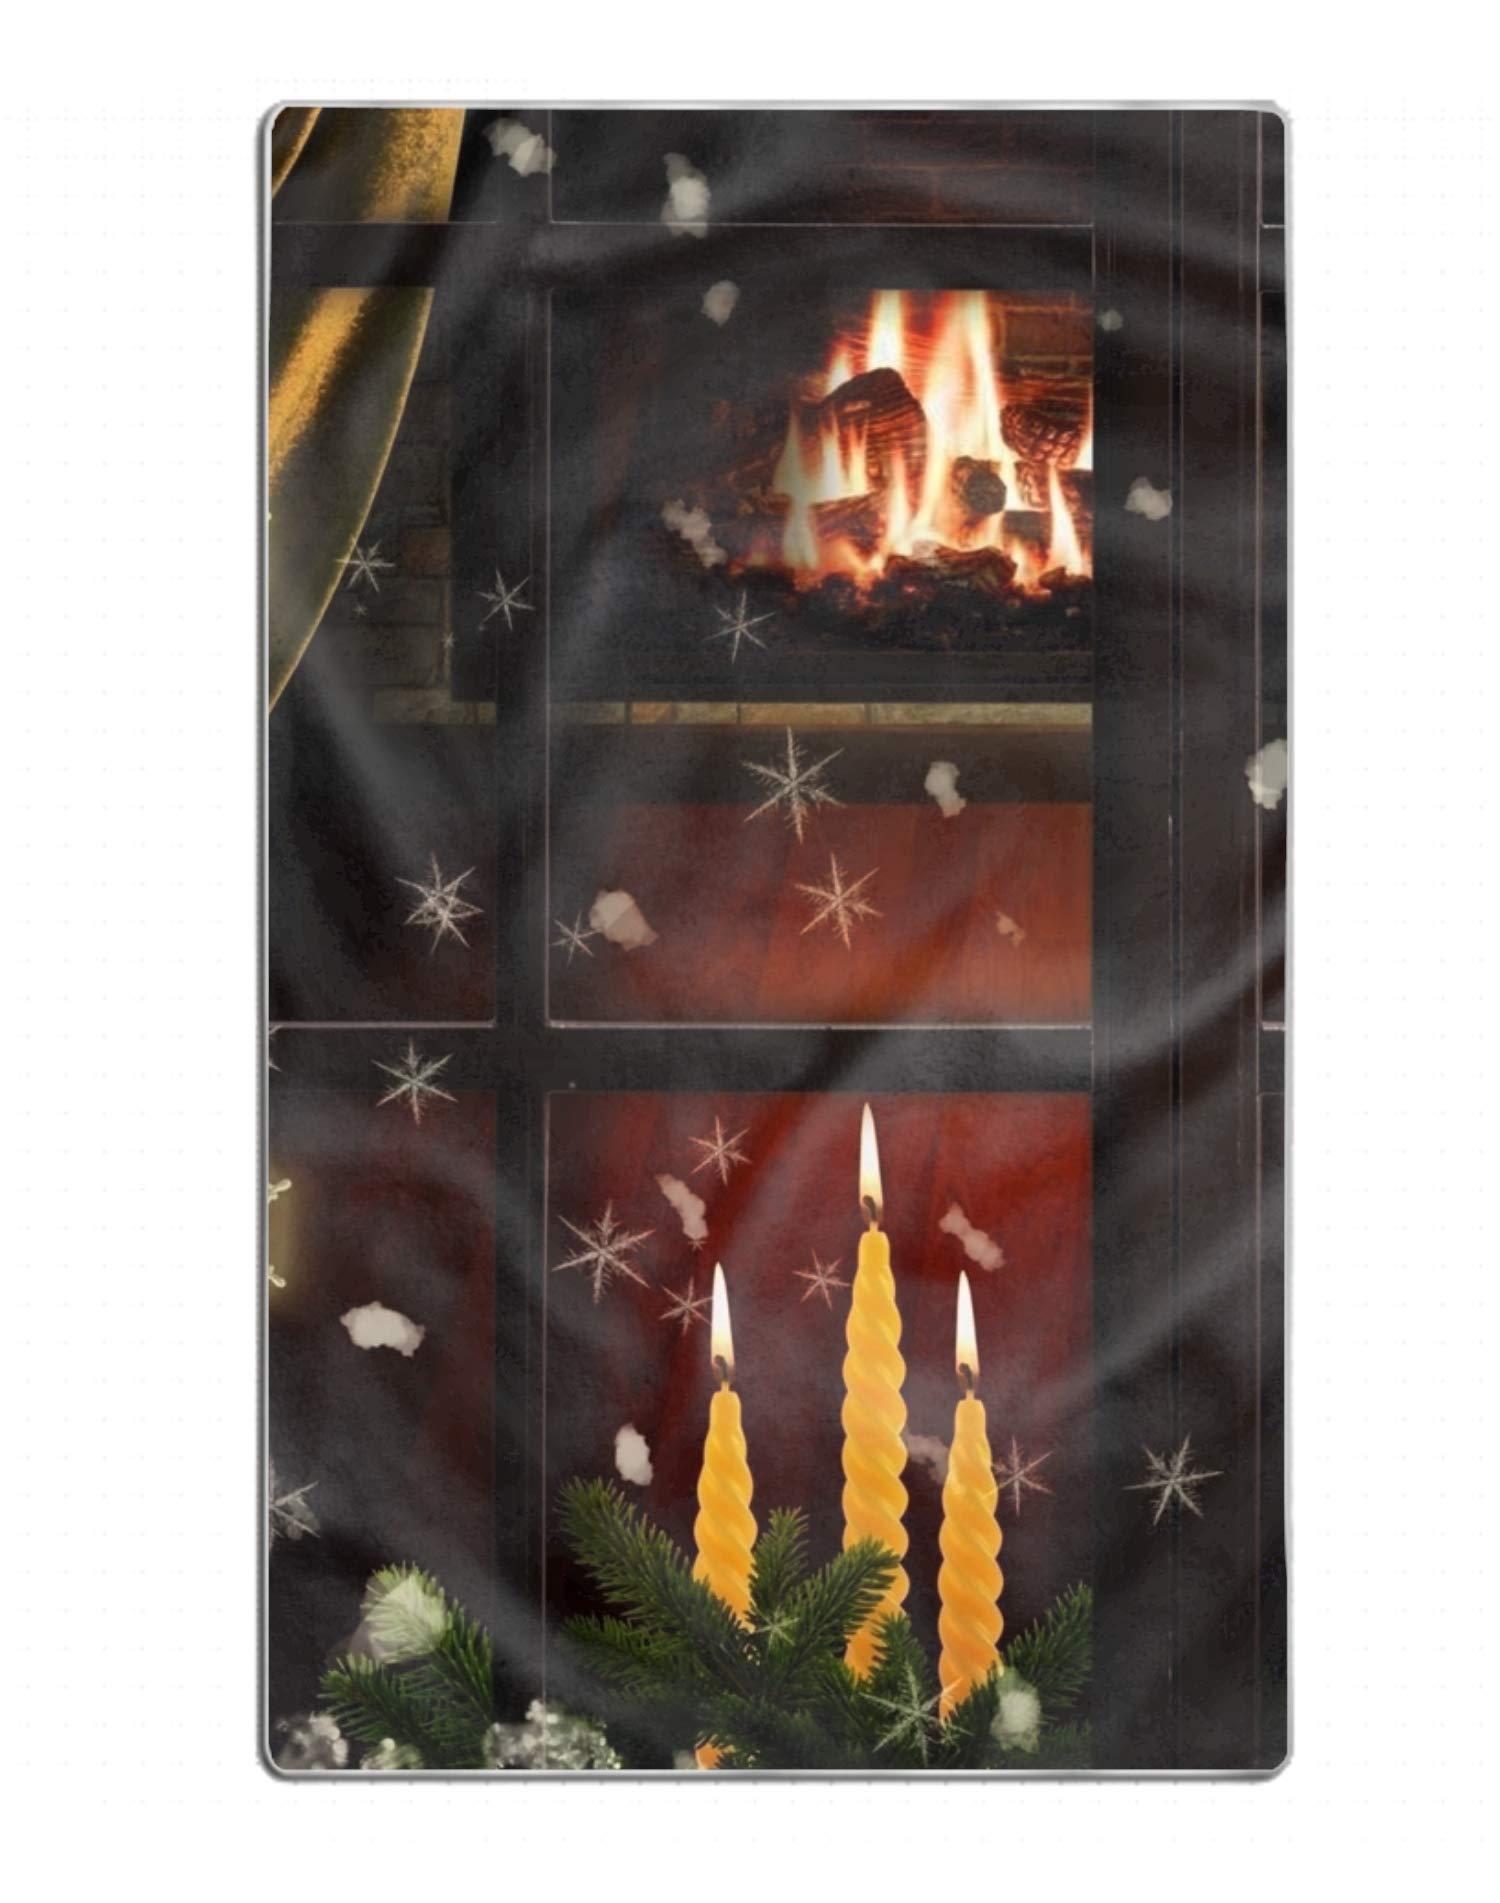 FGNZ Holiday Christmas Tree Candle Window Snowflake Fireplace Beach Towels Premium Stylish Bath Beach Spa Fitness Towel